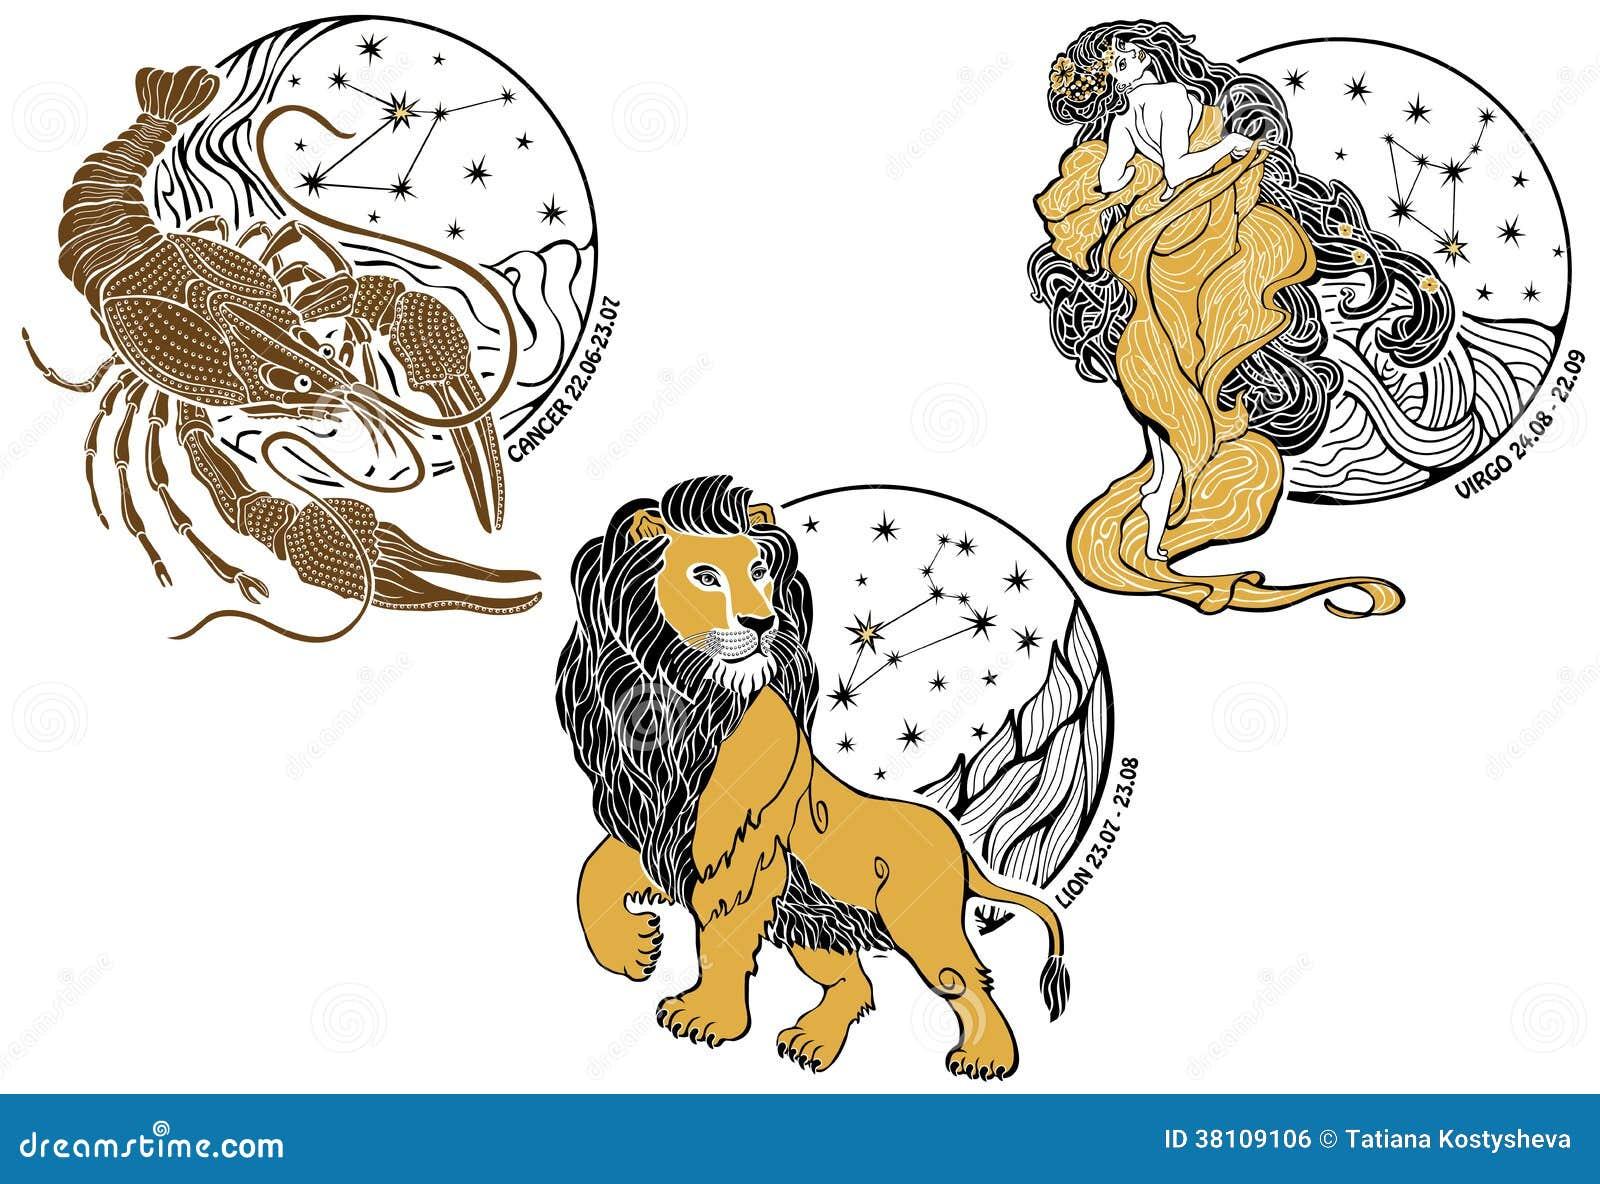 Scorpione dating Leo